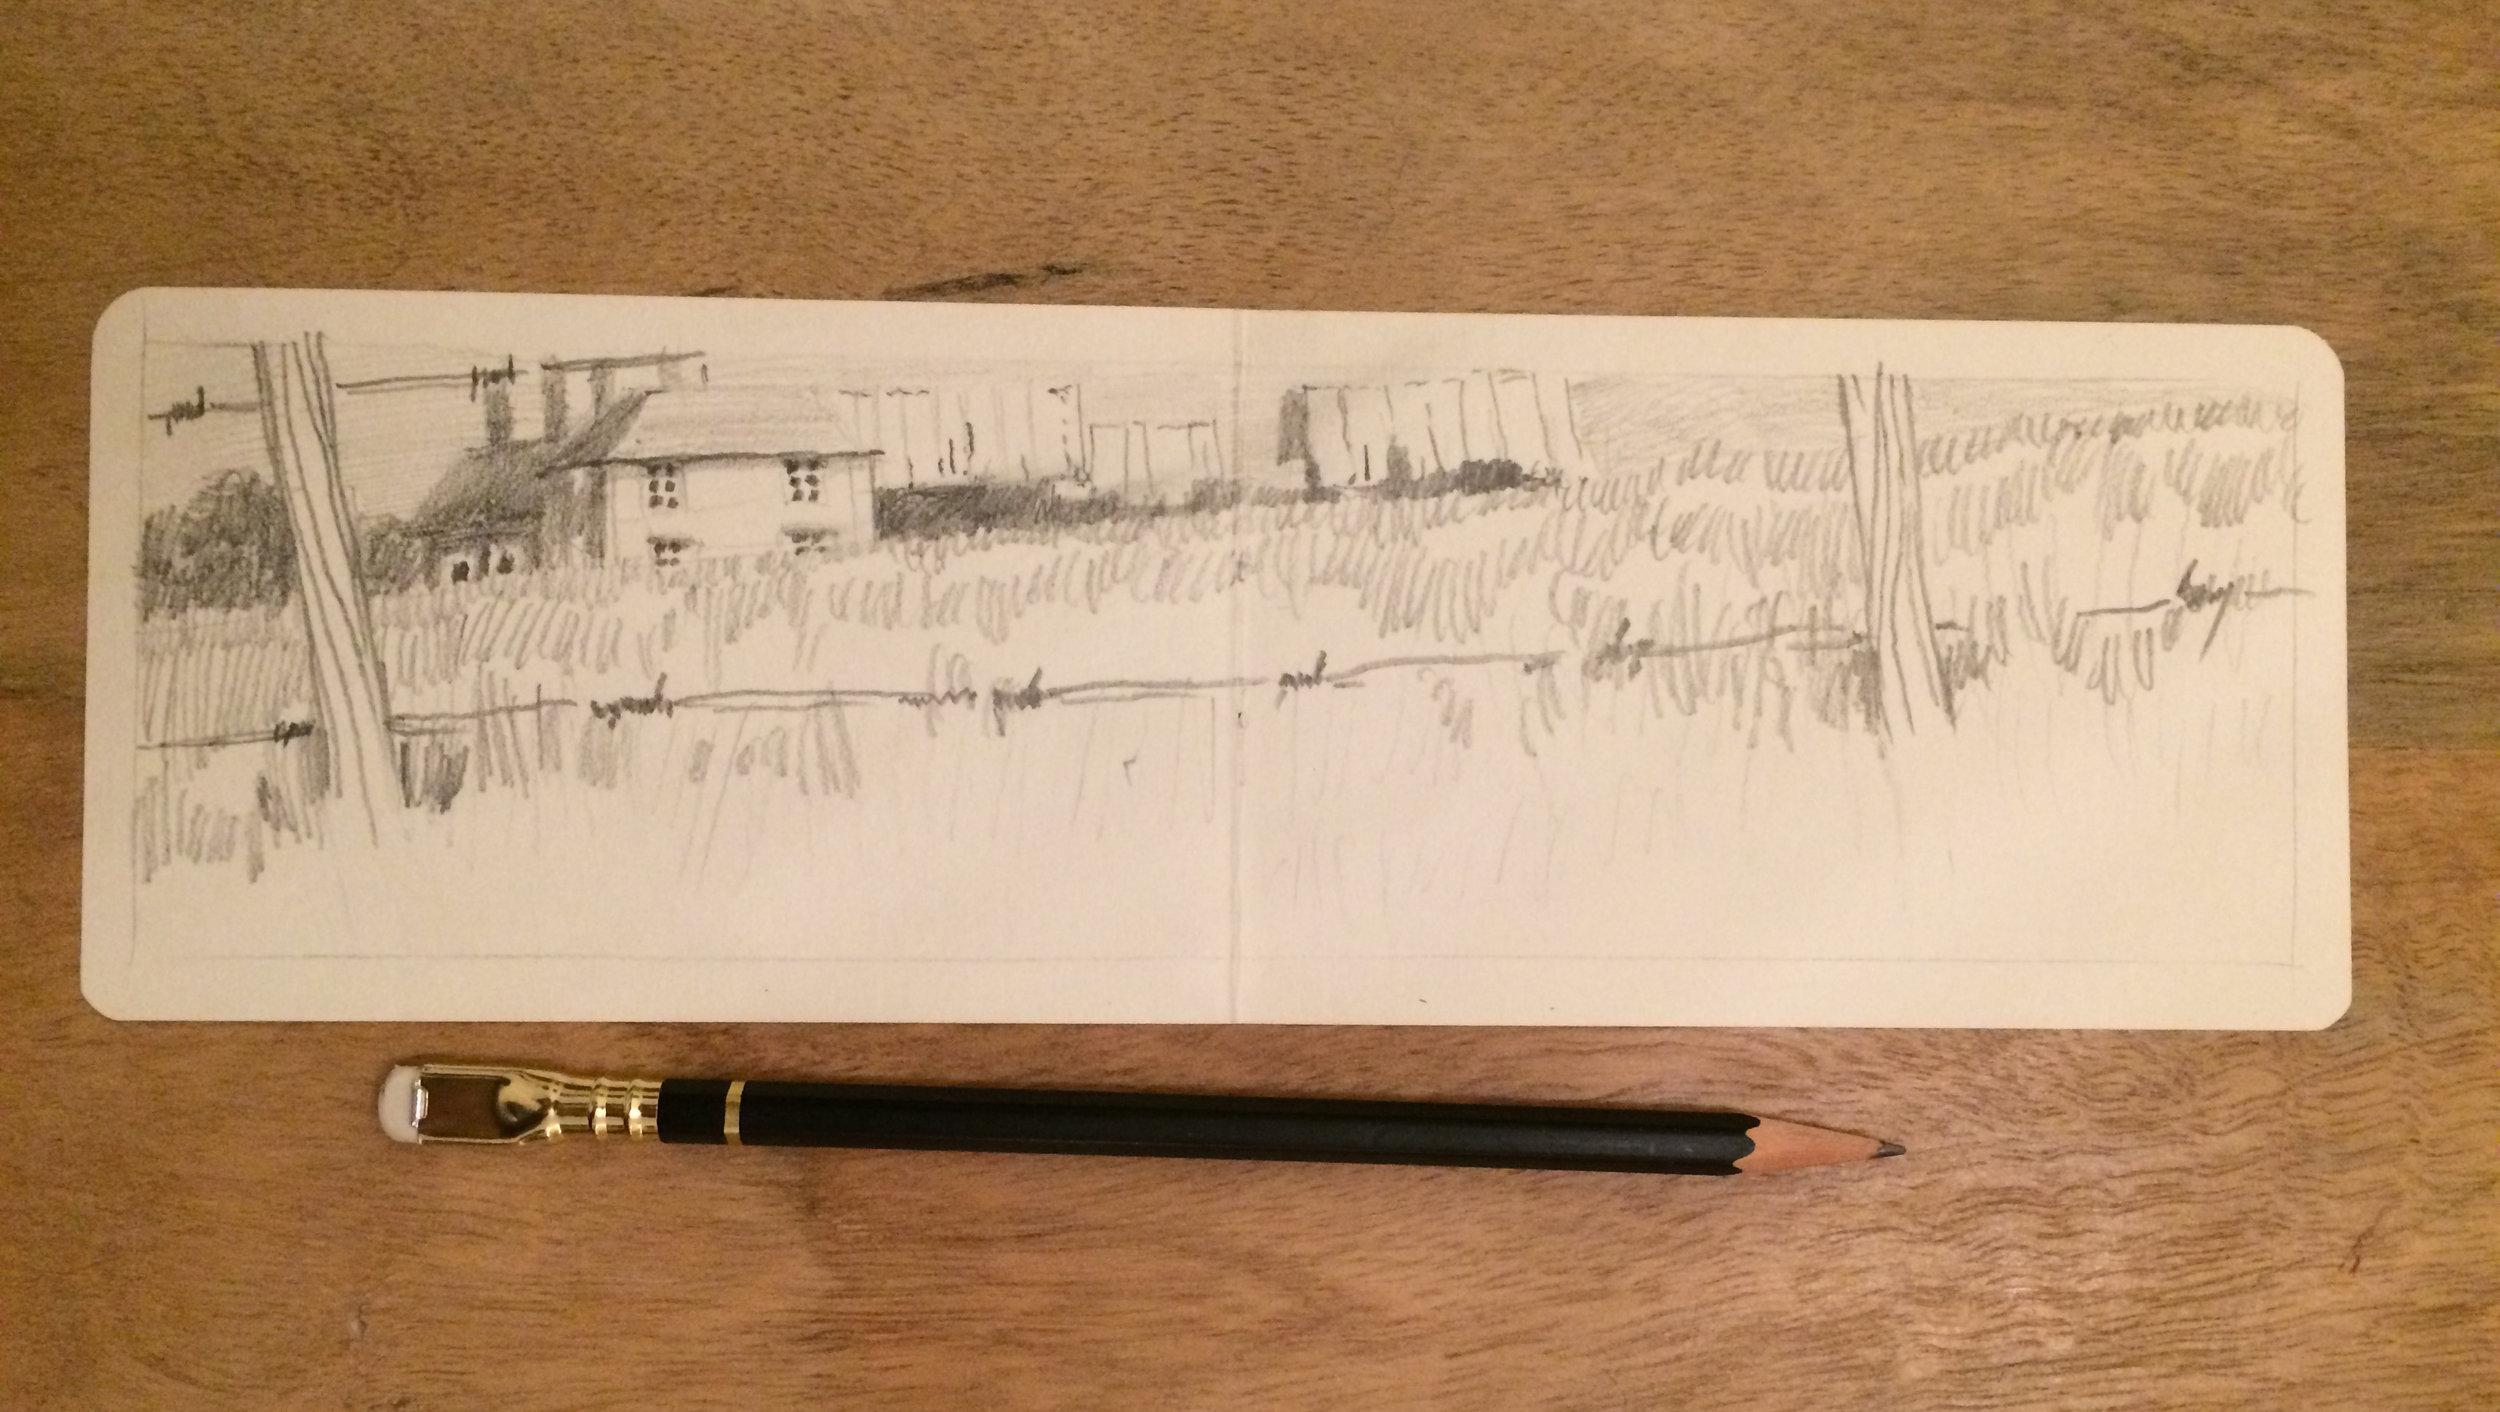 RAFAEL MARTIN C Sketchbook_009.jpg